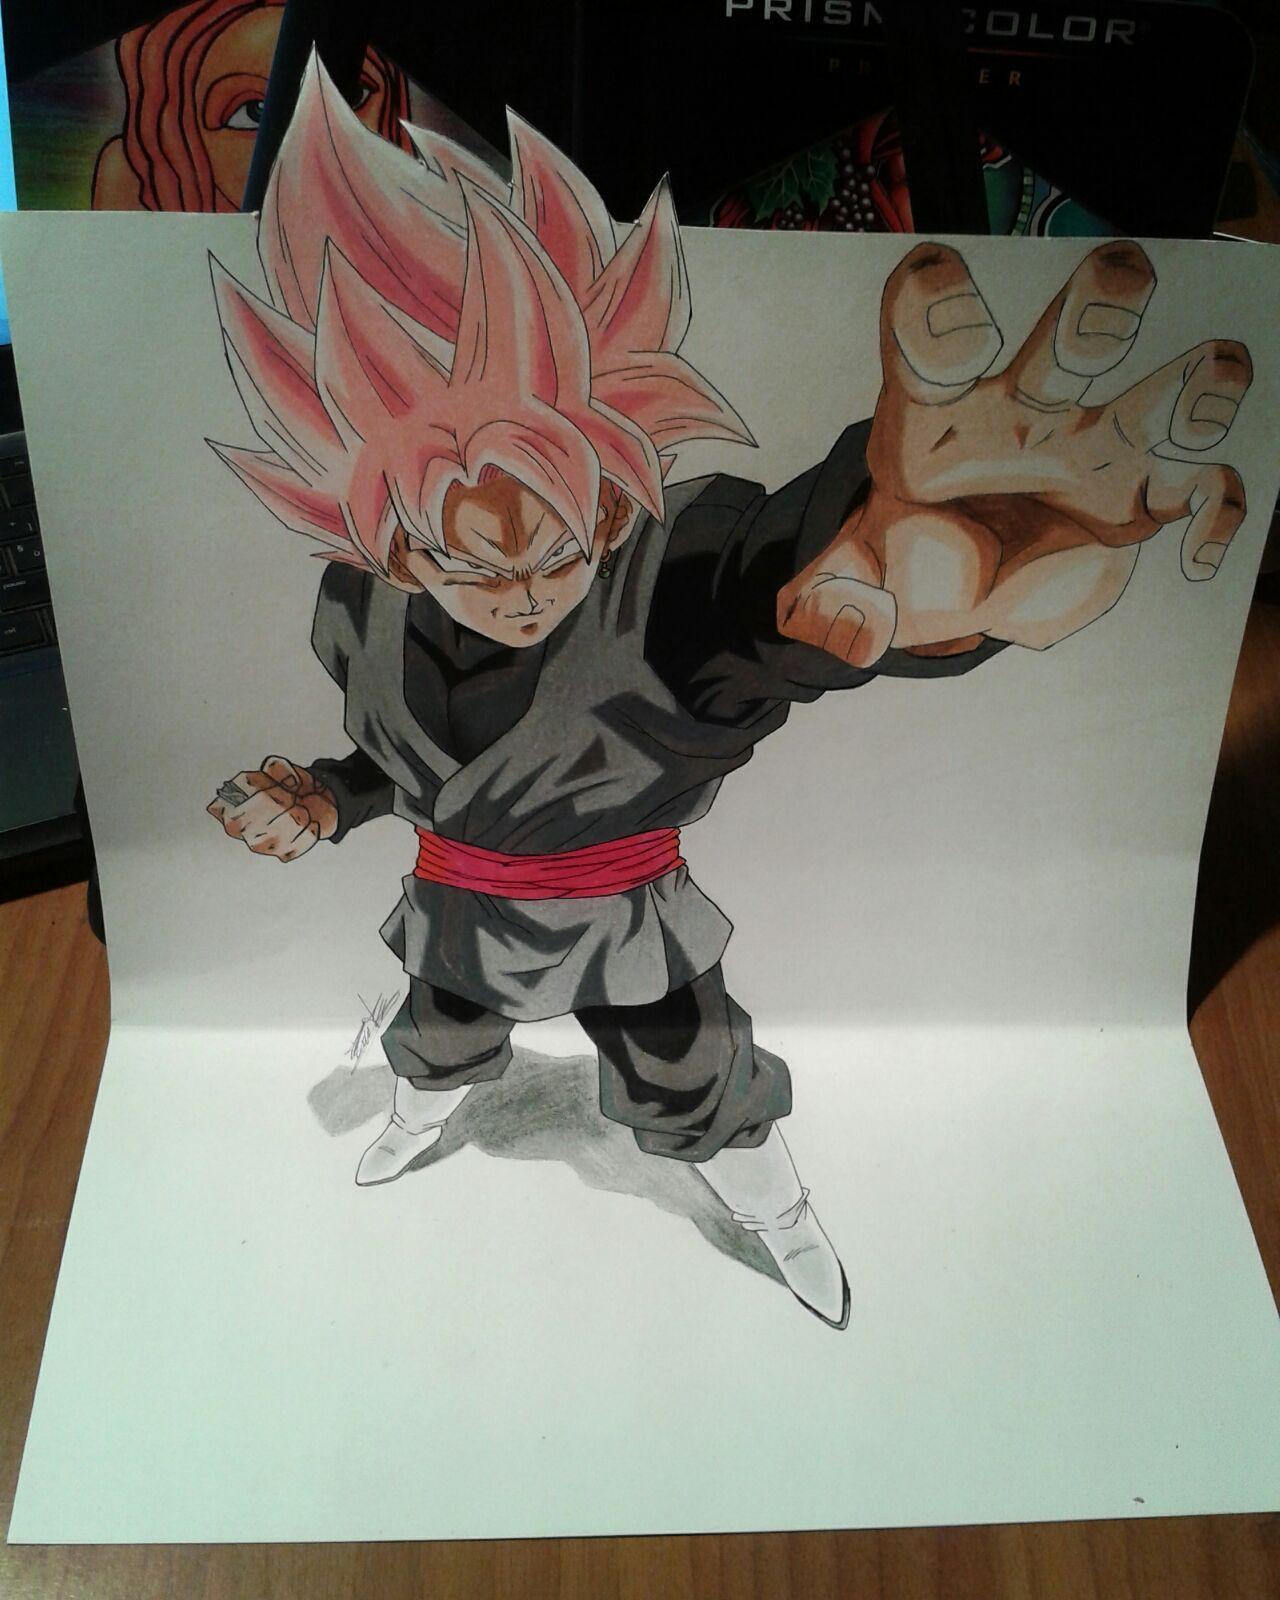 Prismacolor colored pencil drawing of black Goku SSj Rose 3D